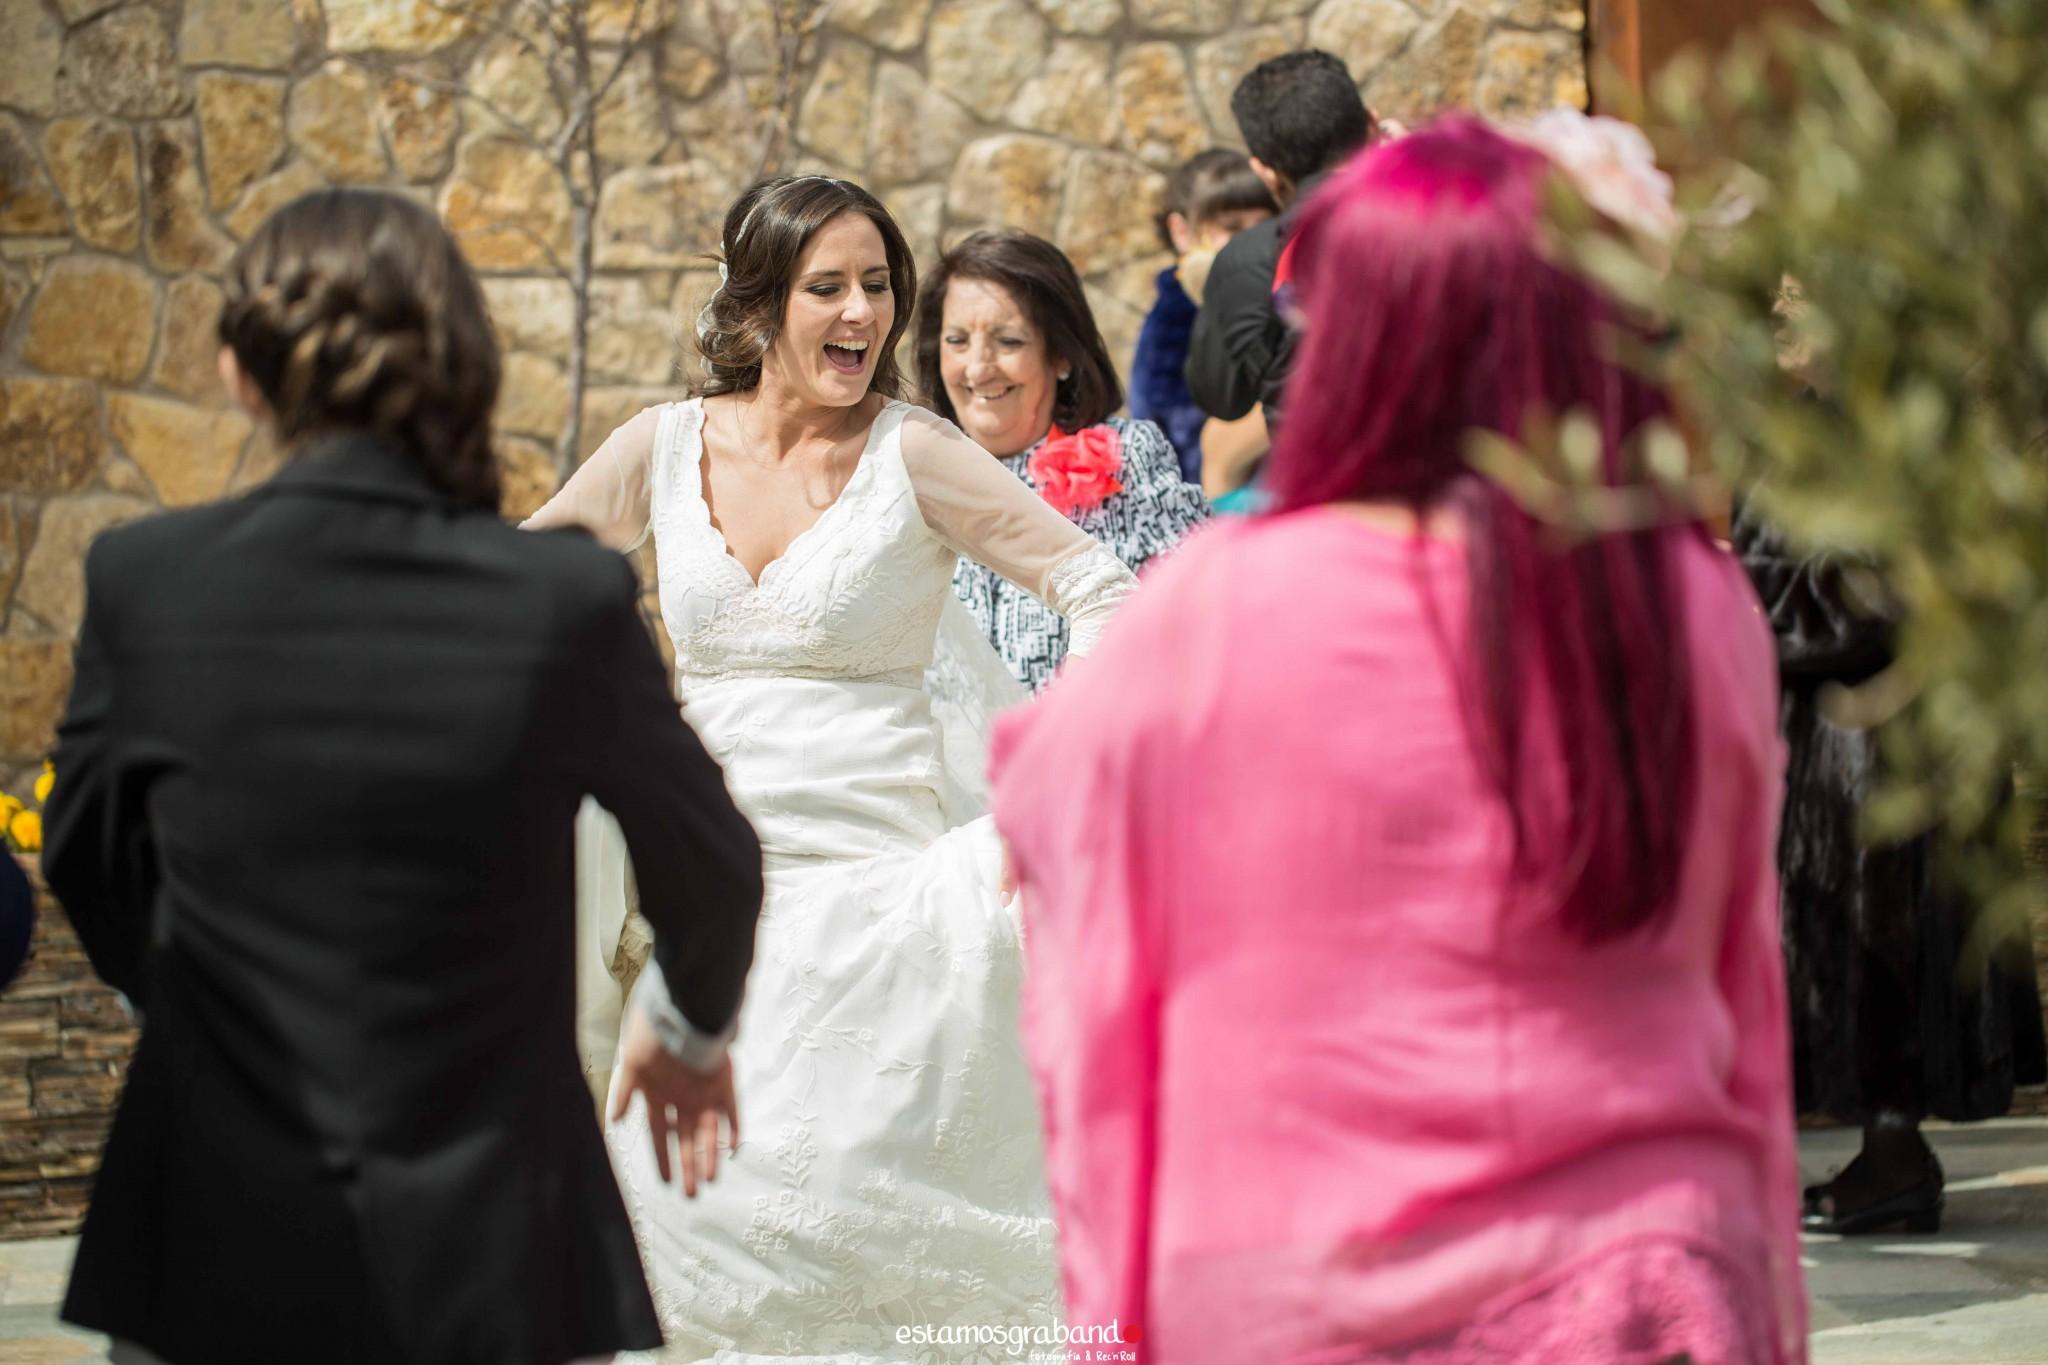 Back to the wedding Virginia & César - estamosgrabando - Fotografia ...